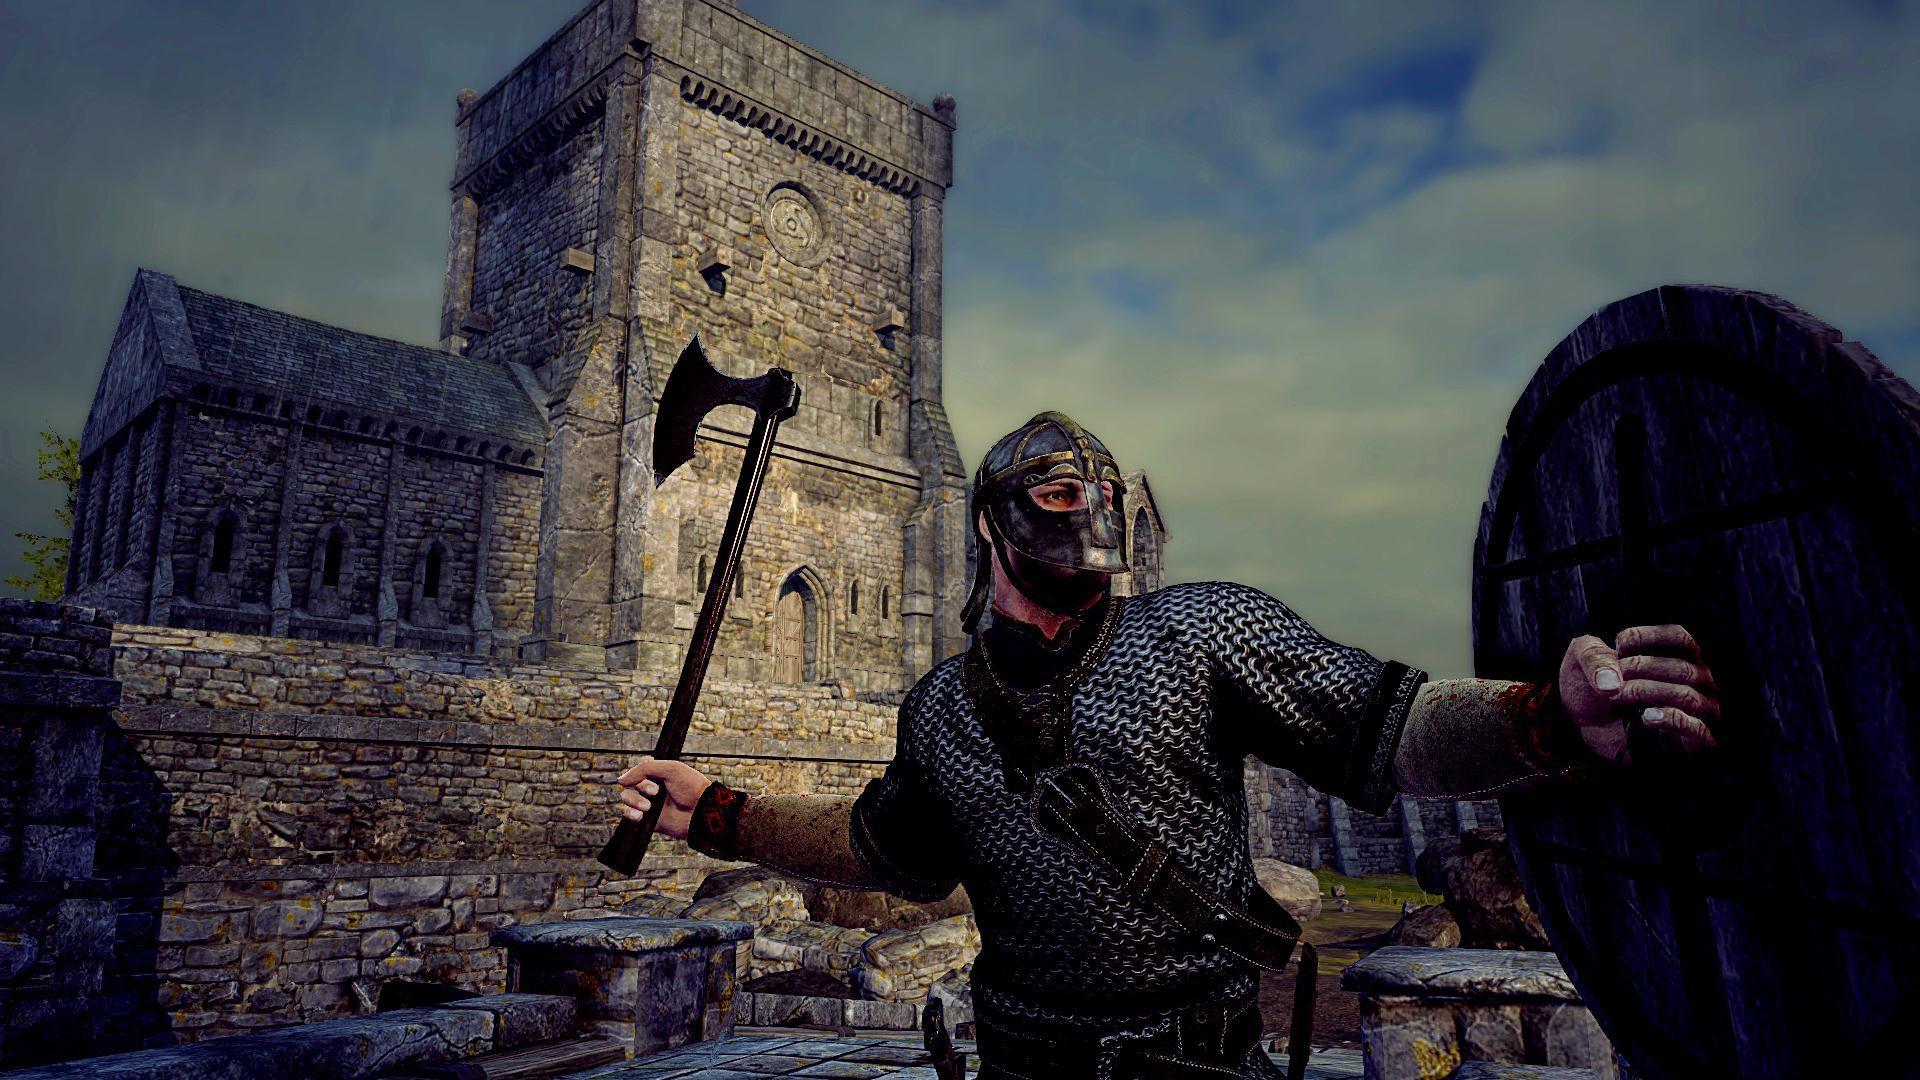 Vikings Wallpapers - Top Free Vikings Backgrounds ...